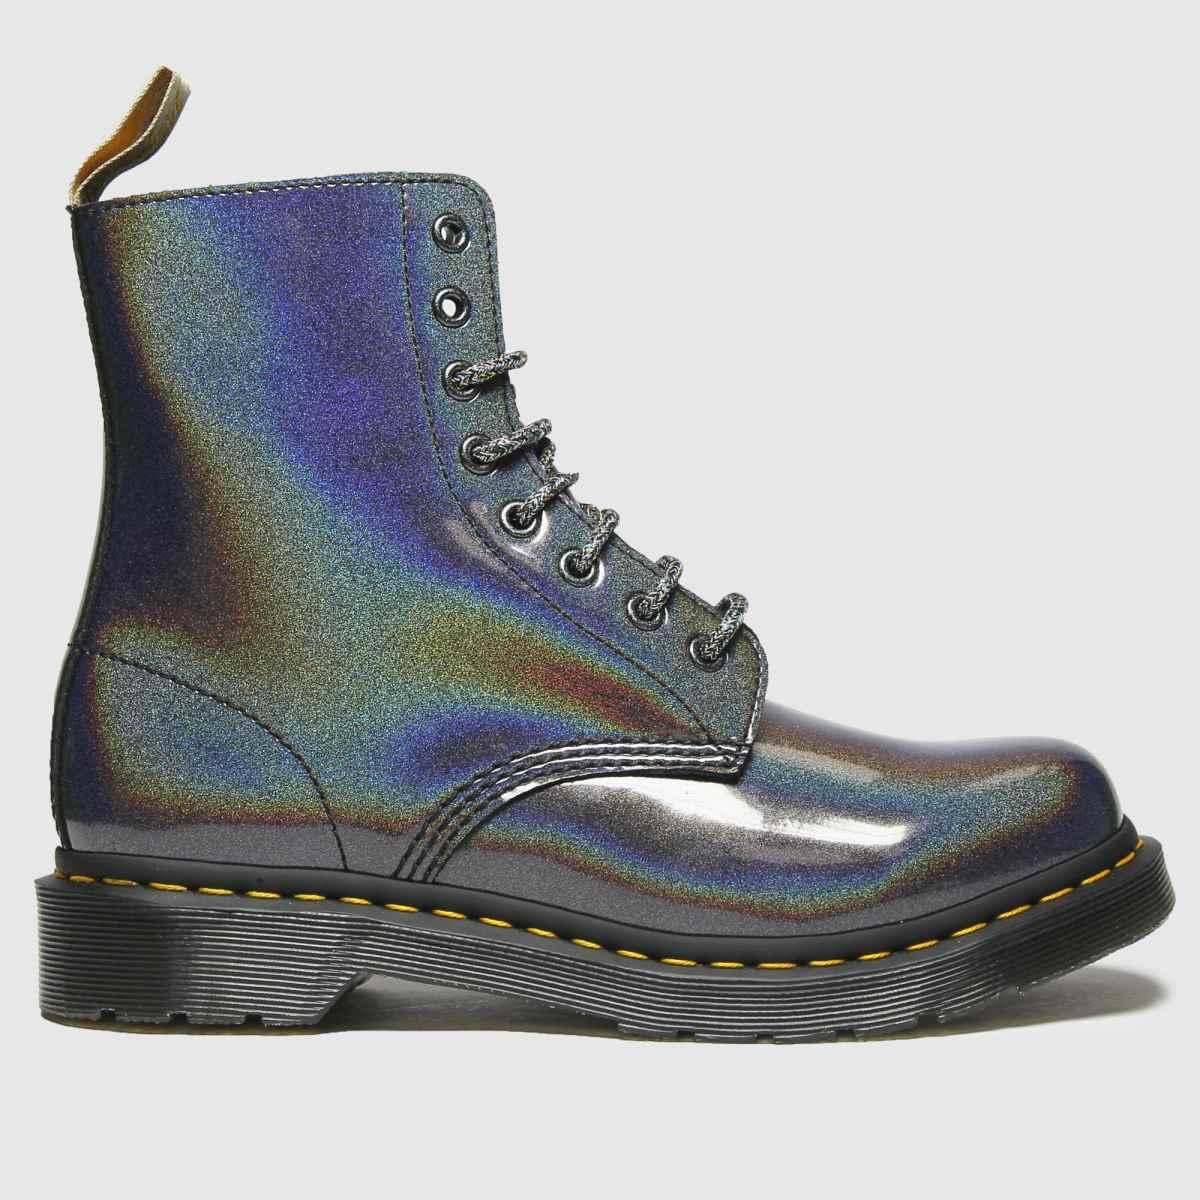 Dr Martens Silver Vegan 1460 Pascal Boots